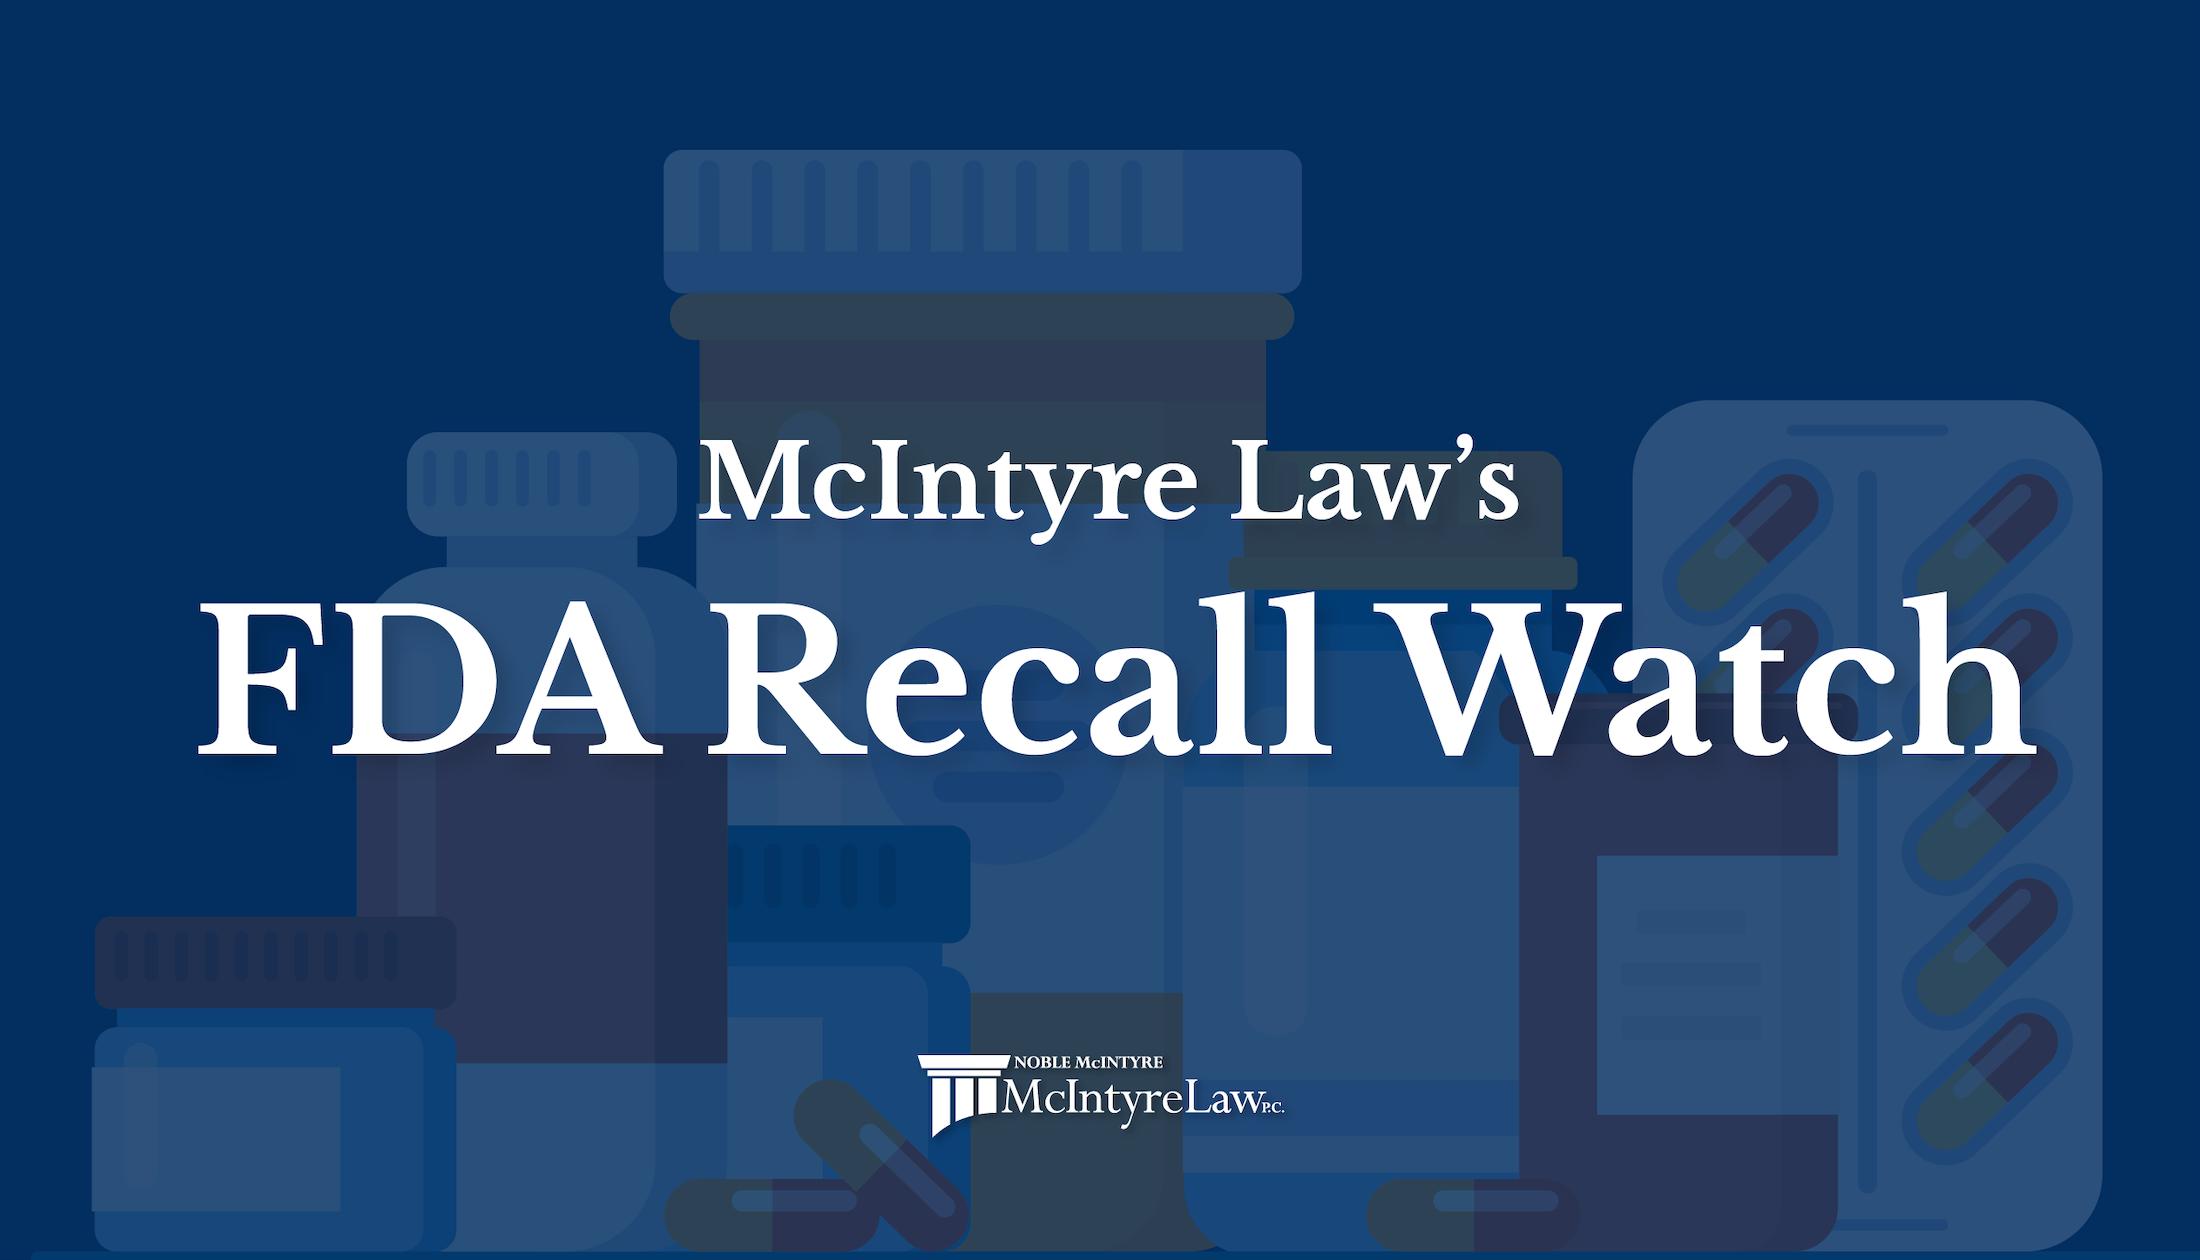 McIntyre Law's FDA Recall Watch